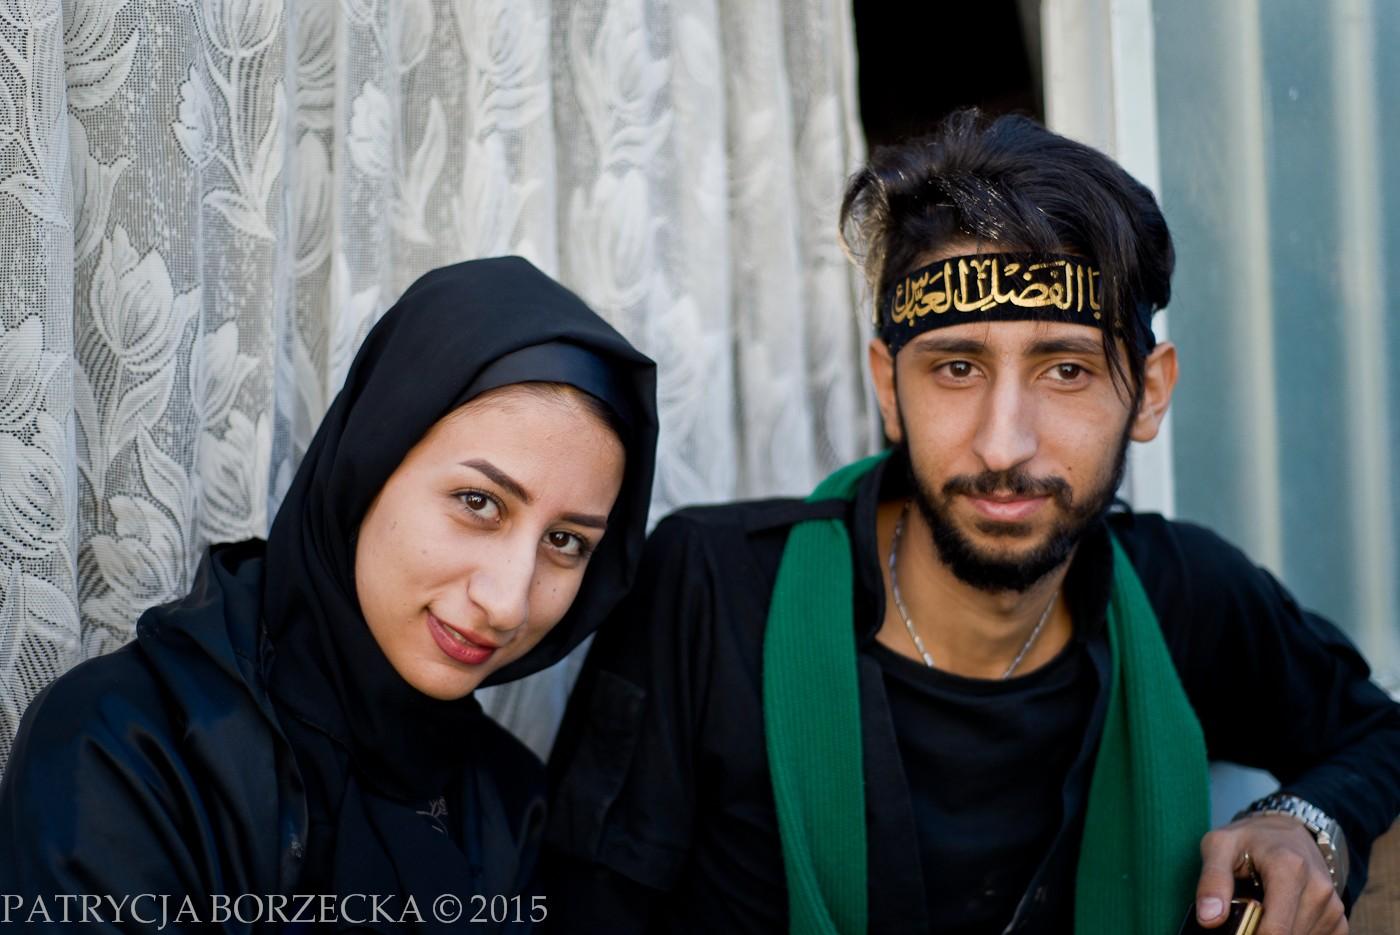 PatrycjaBorzecka-photography-Iran-people04